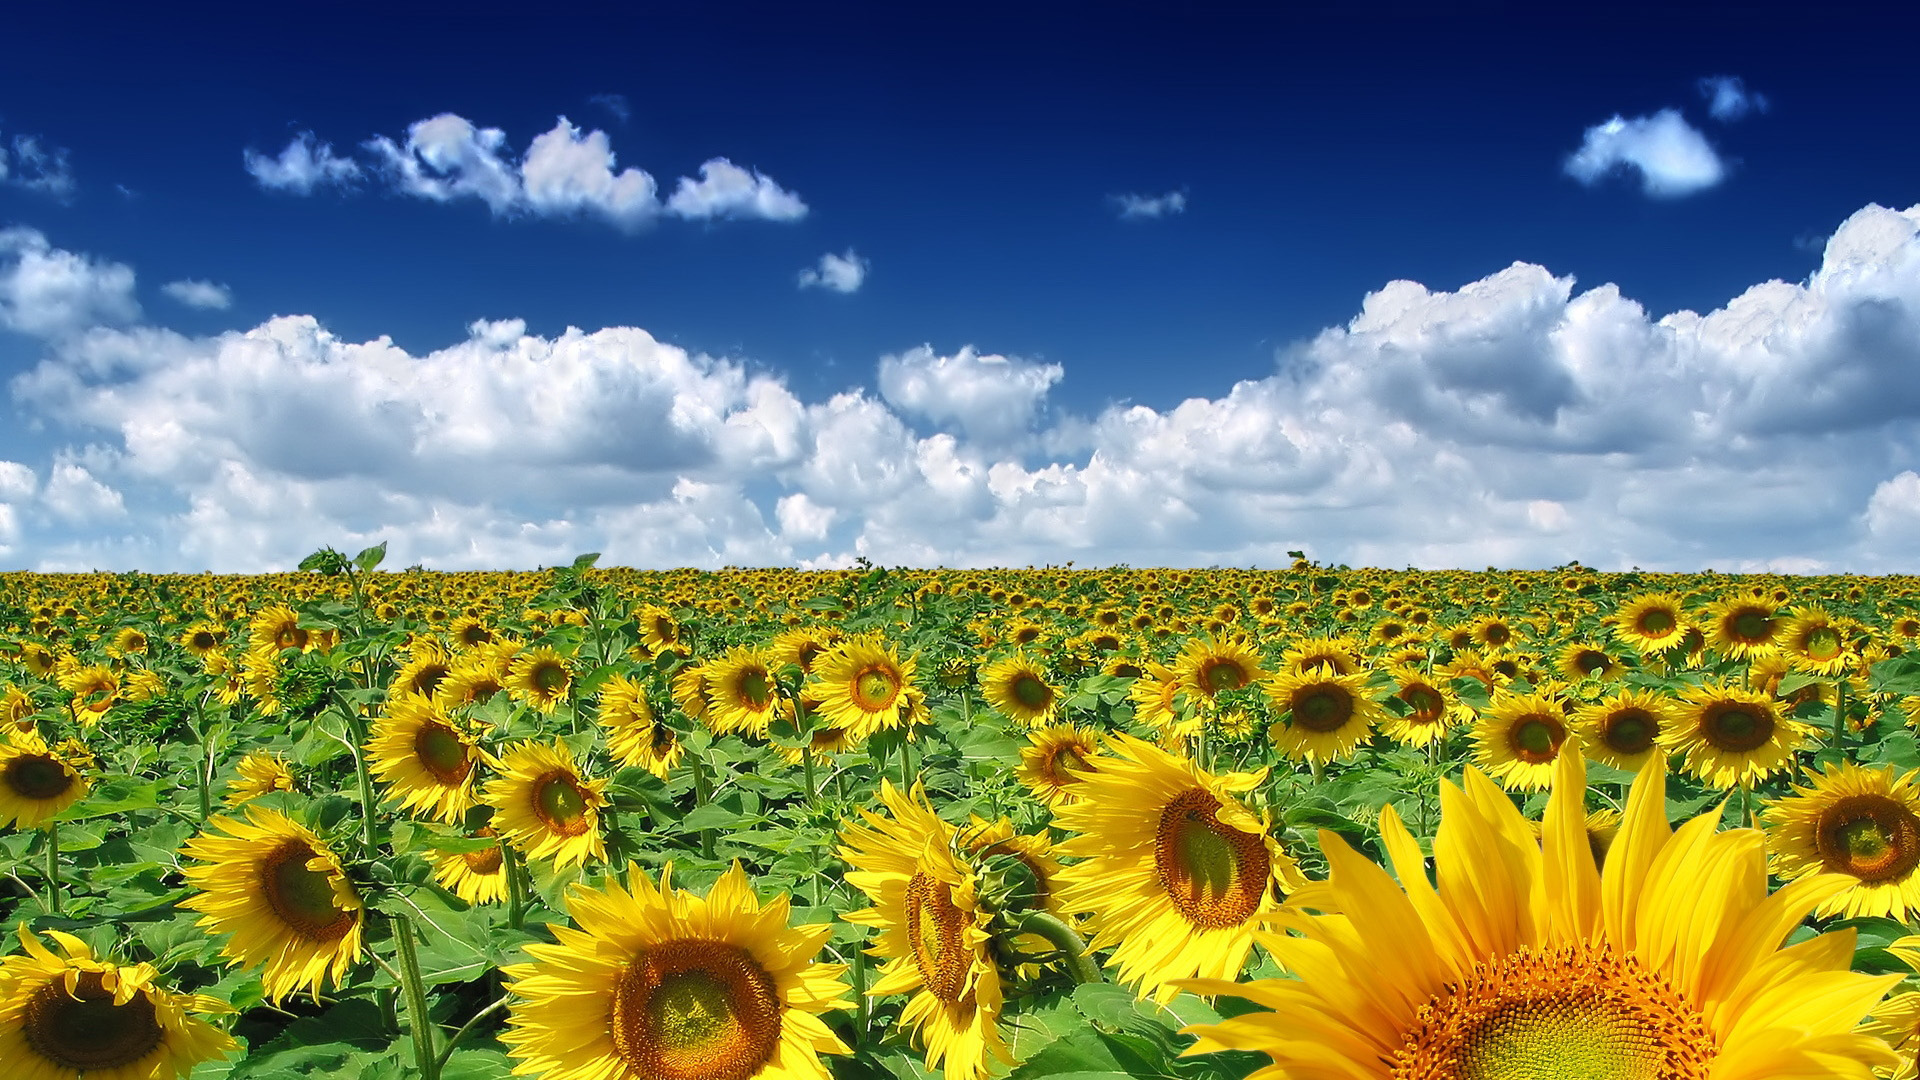 free-spring-wallpaper-sunflowers